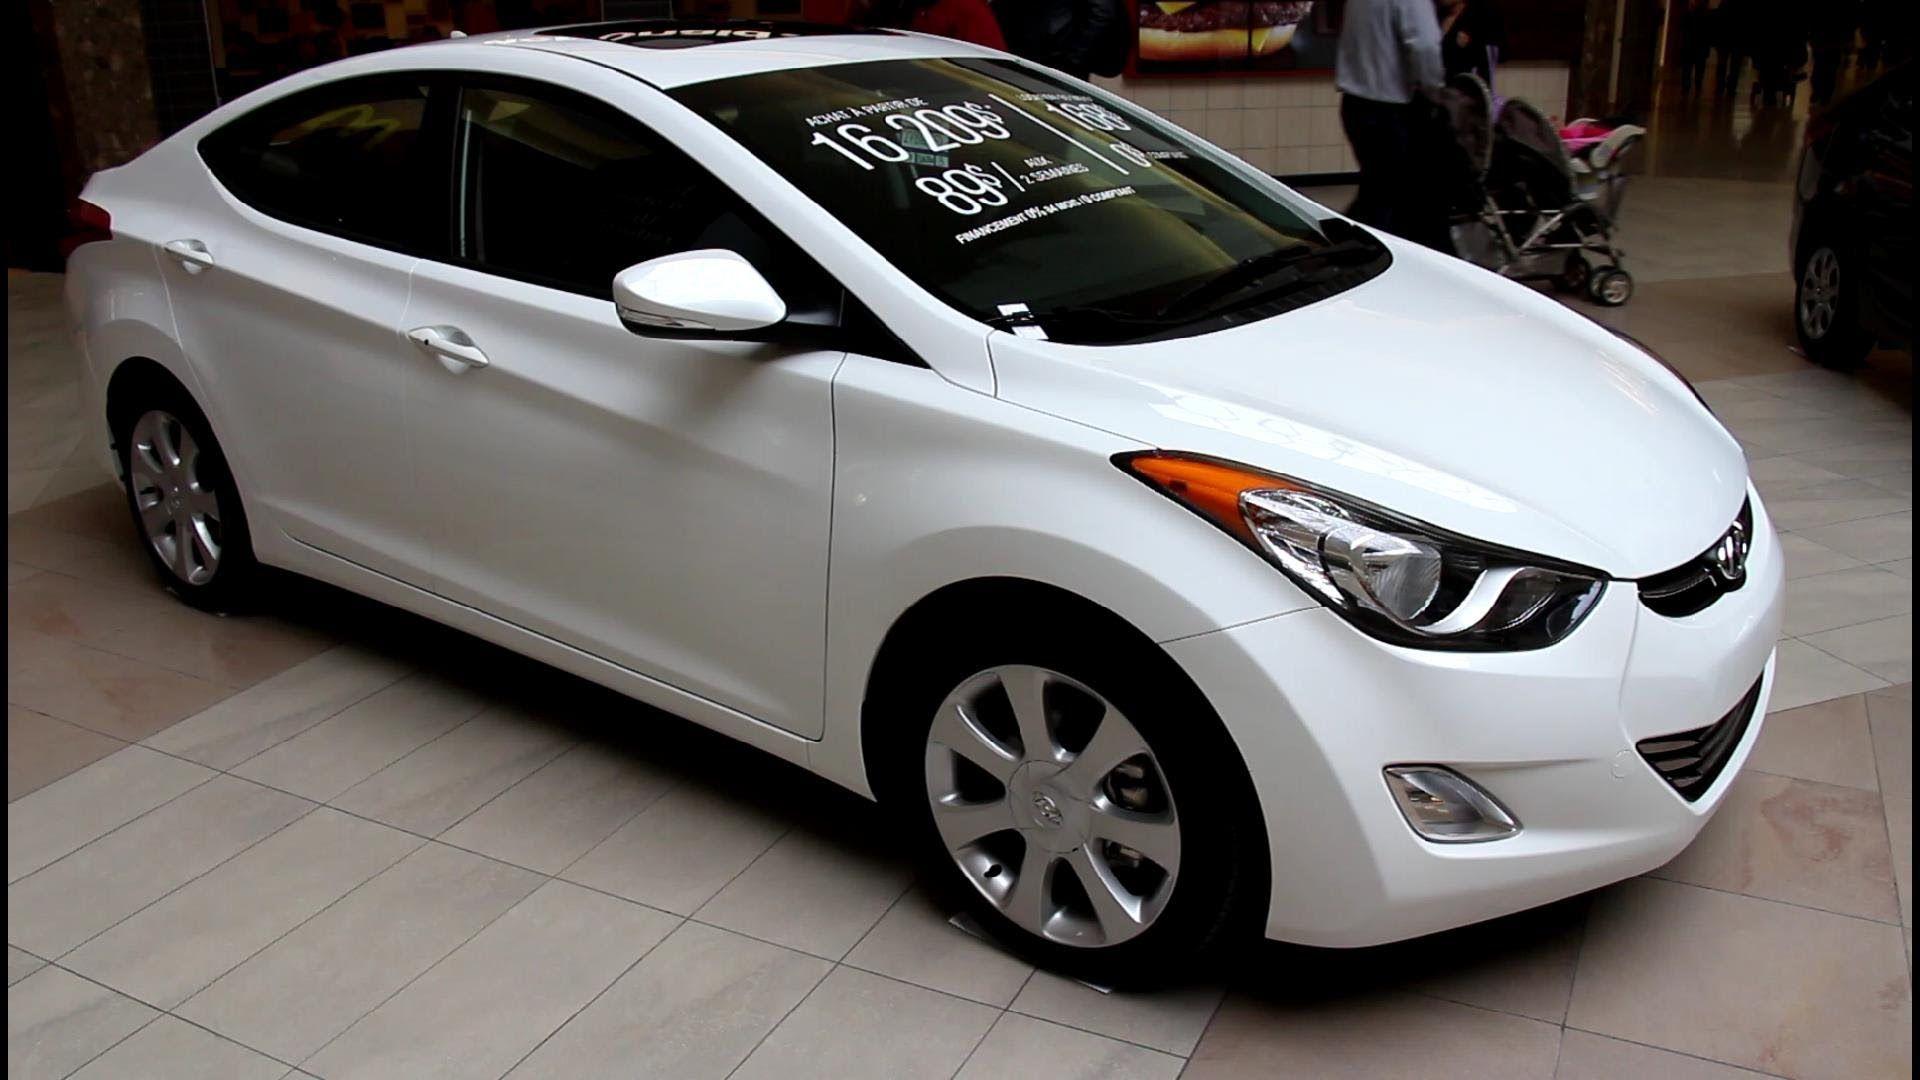 The 25 best elantra price ideas on pinterest hyundai sports car hyundai suv and suv cars